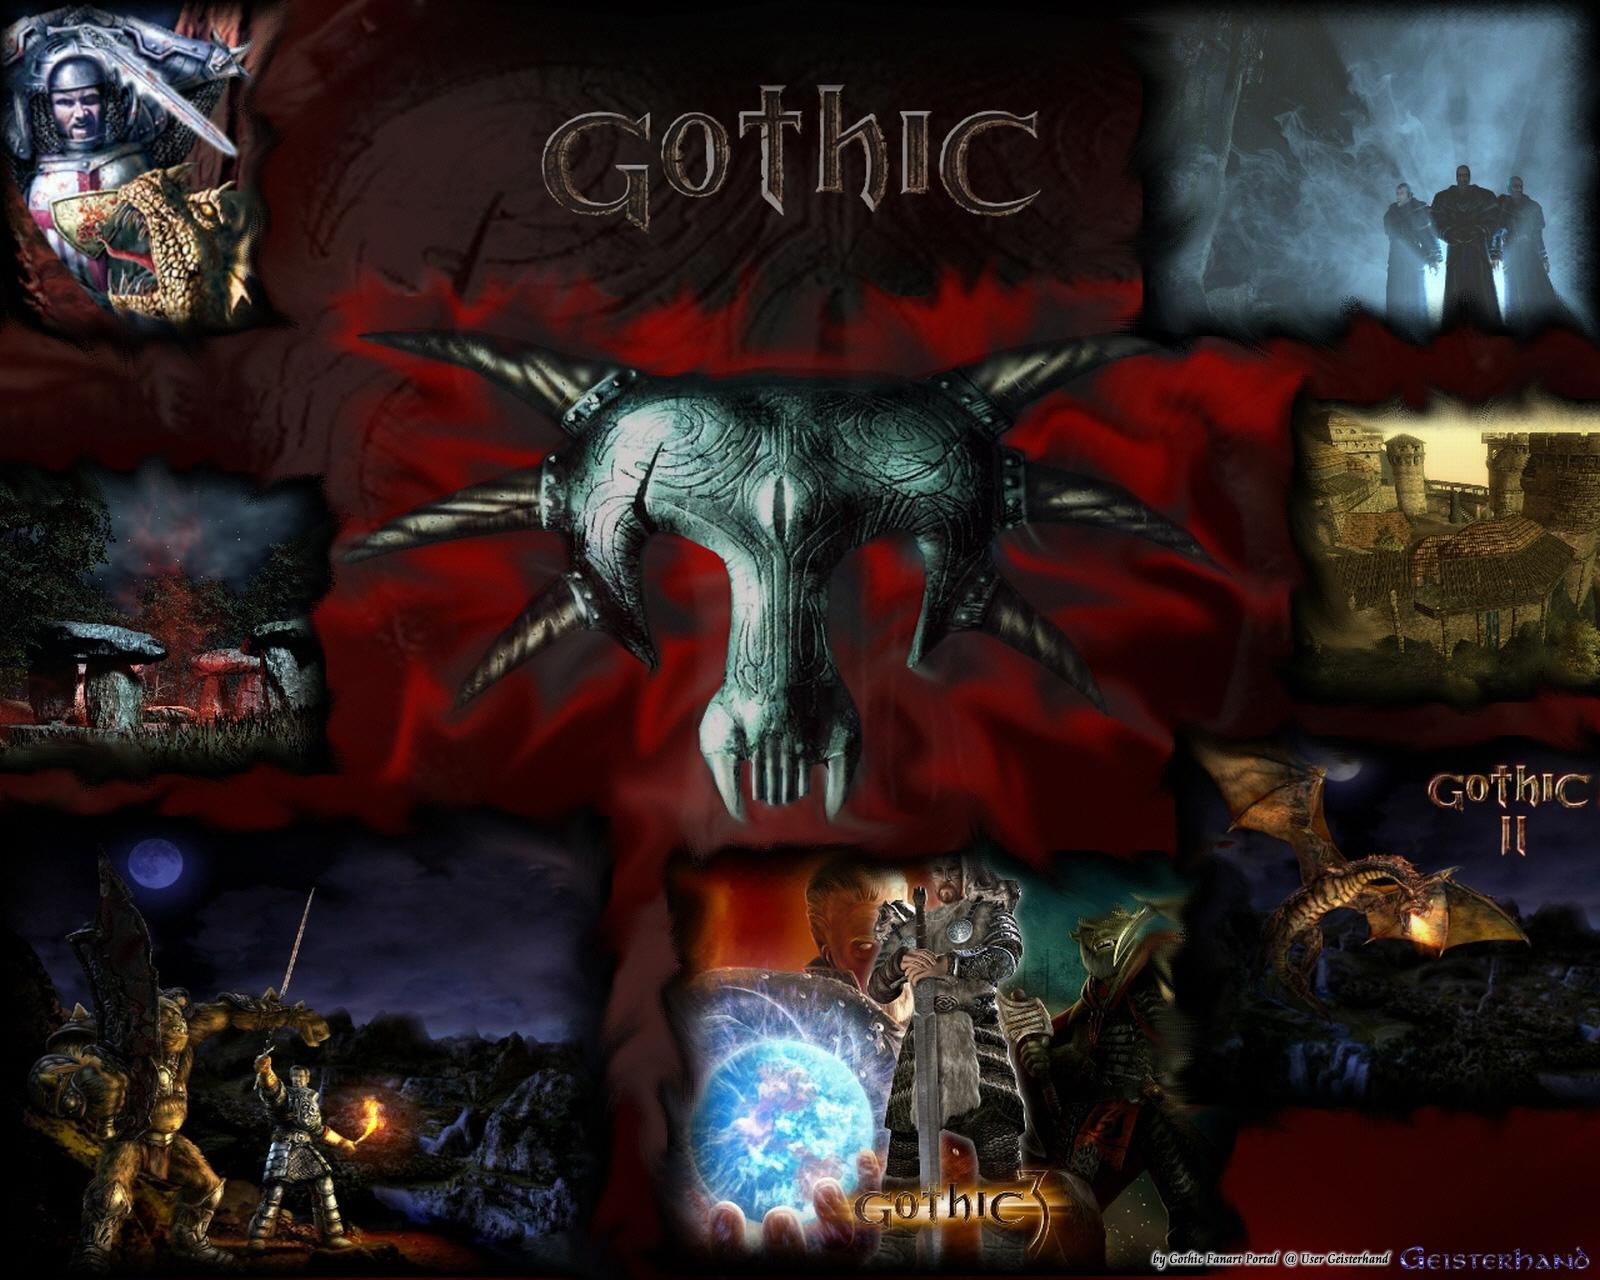 Gothic 2 wallpaper - Gothic adventskalender ...